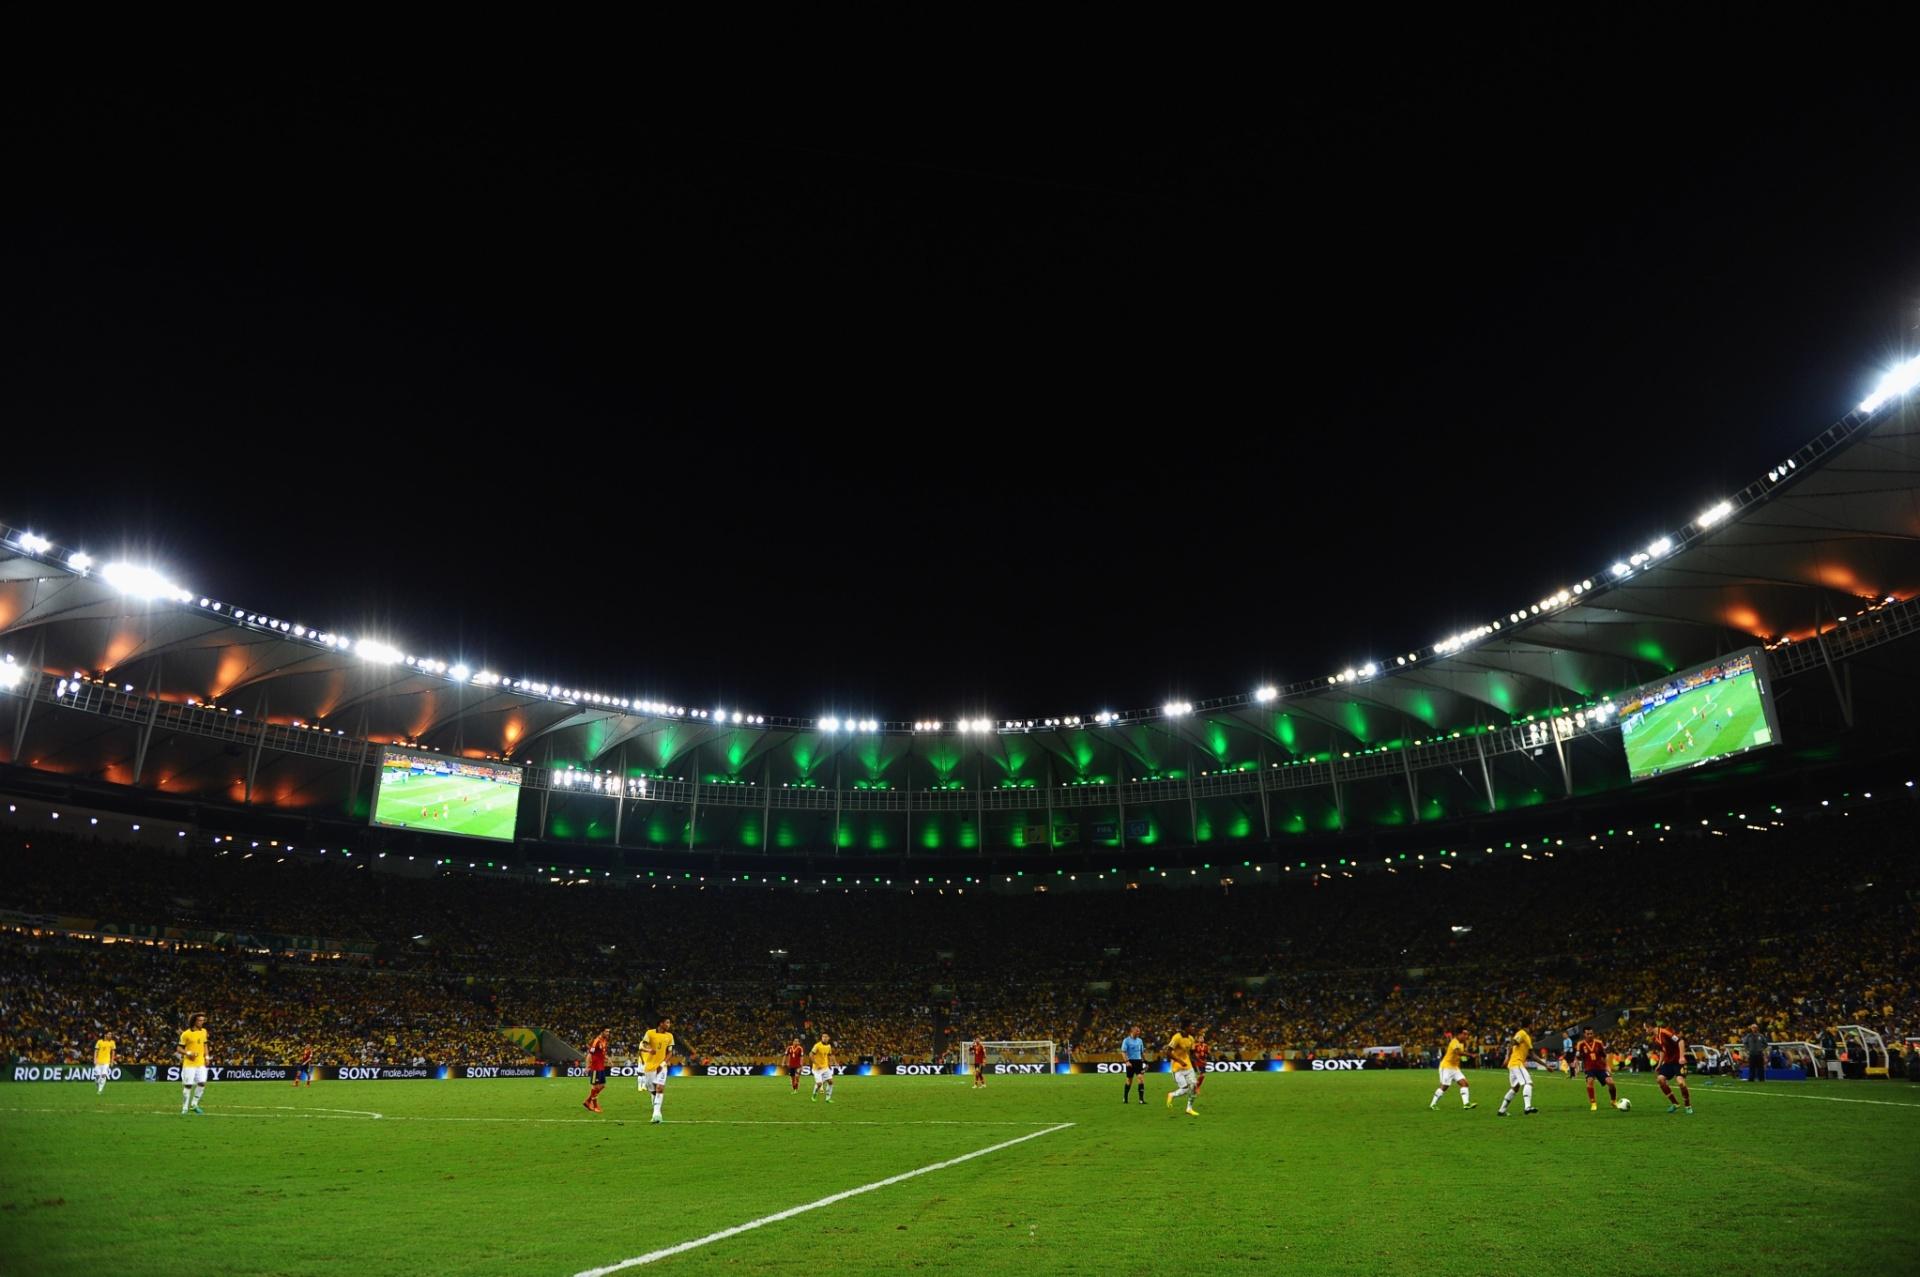 Foto noturna do Maracanã